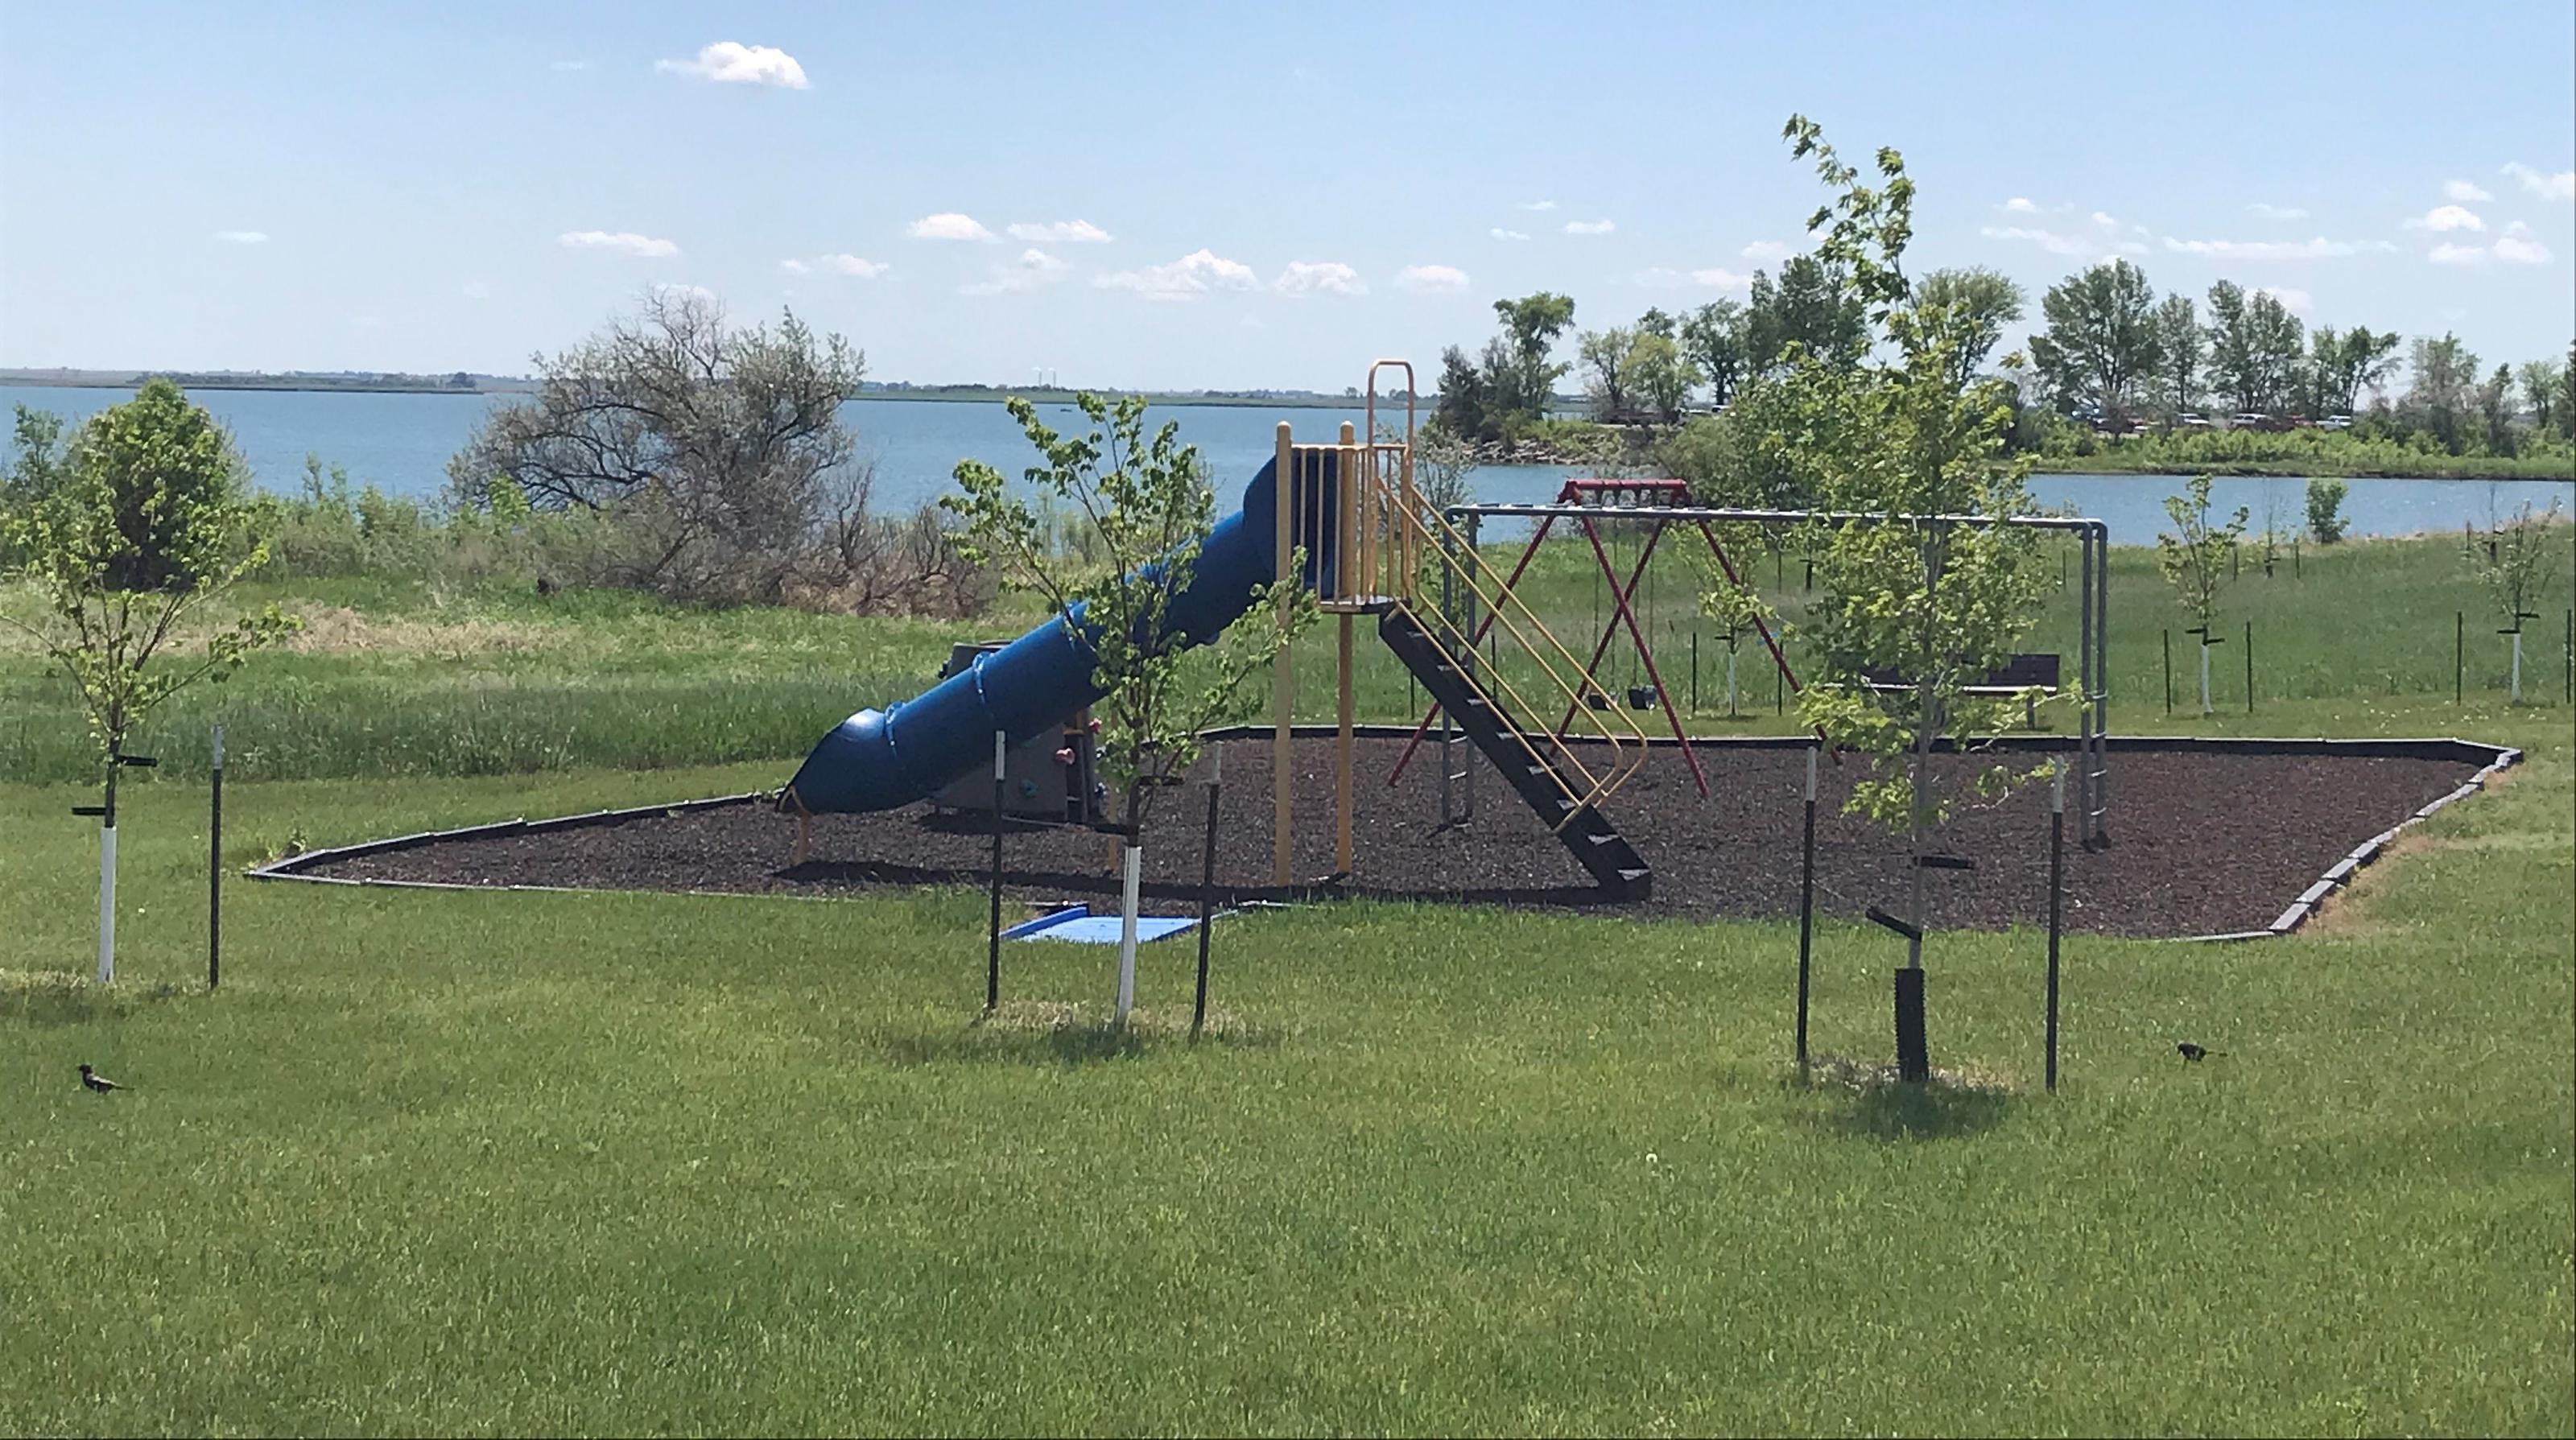 Playground at East Totten Trail on Lake Audubon